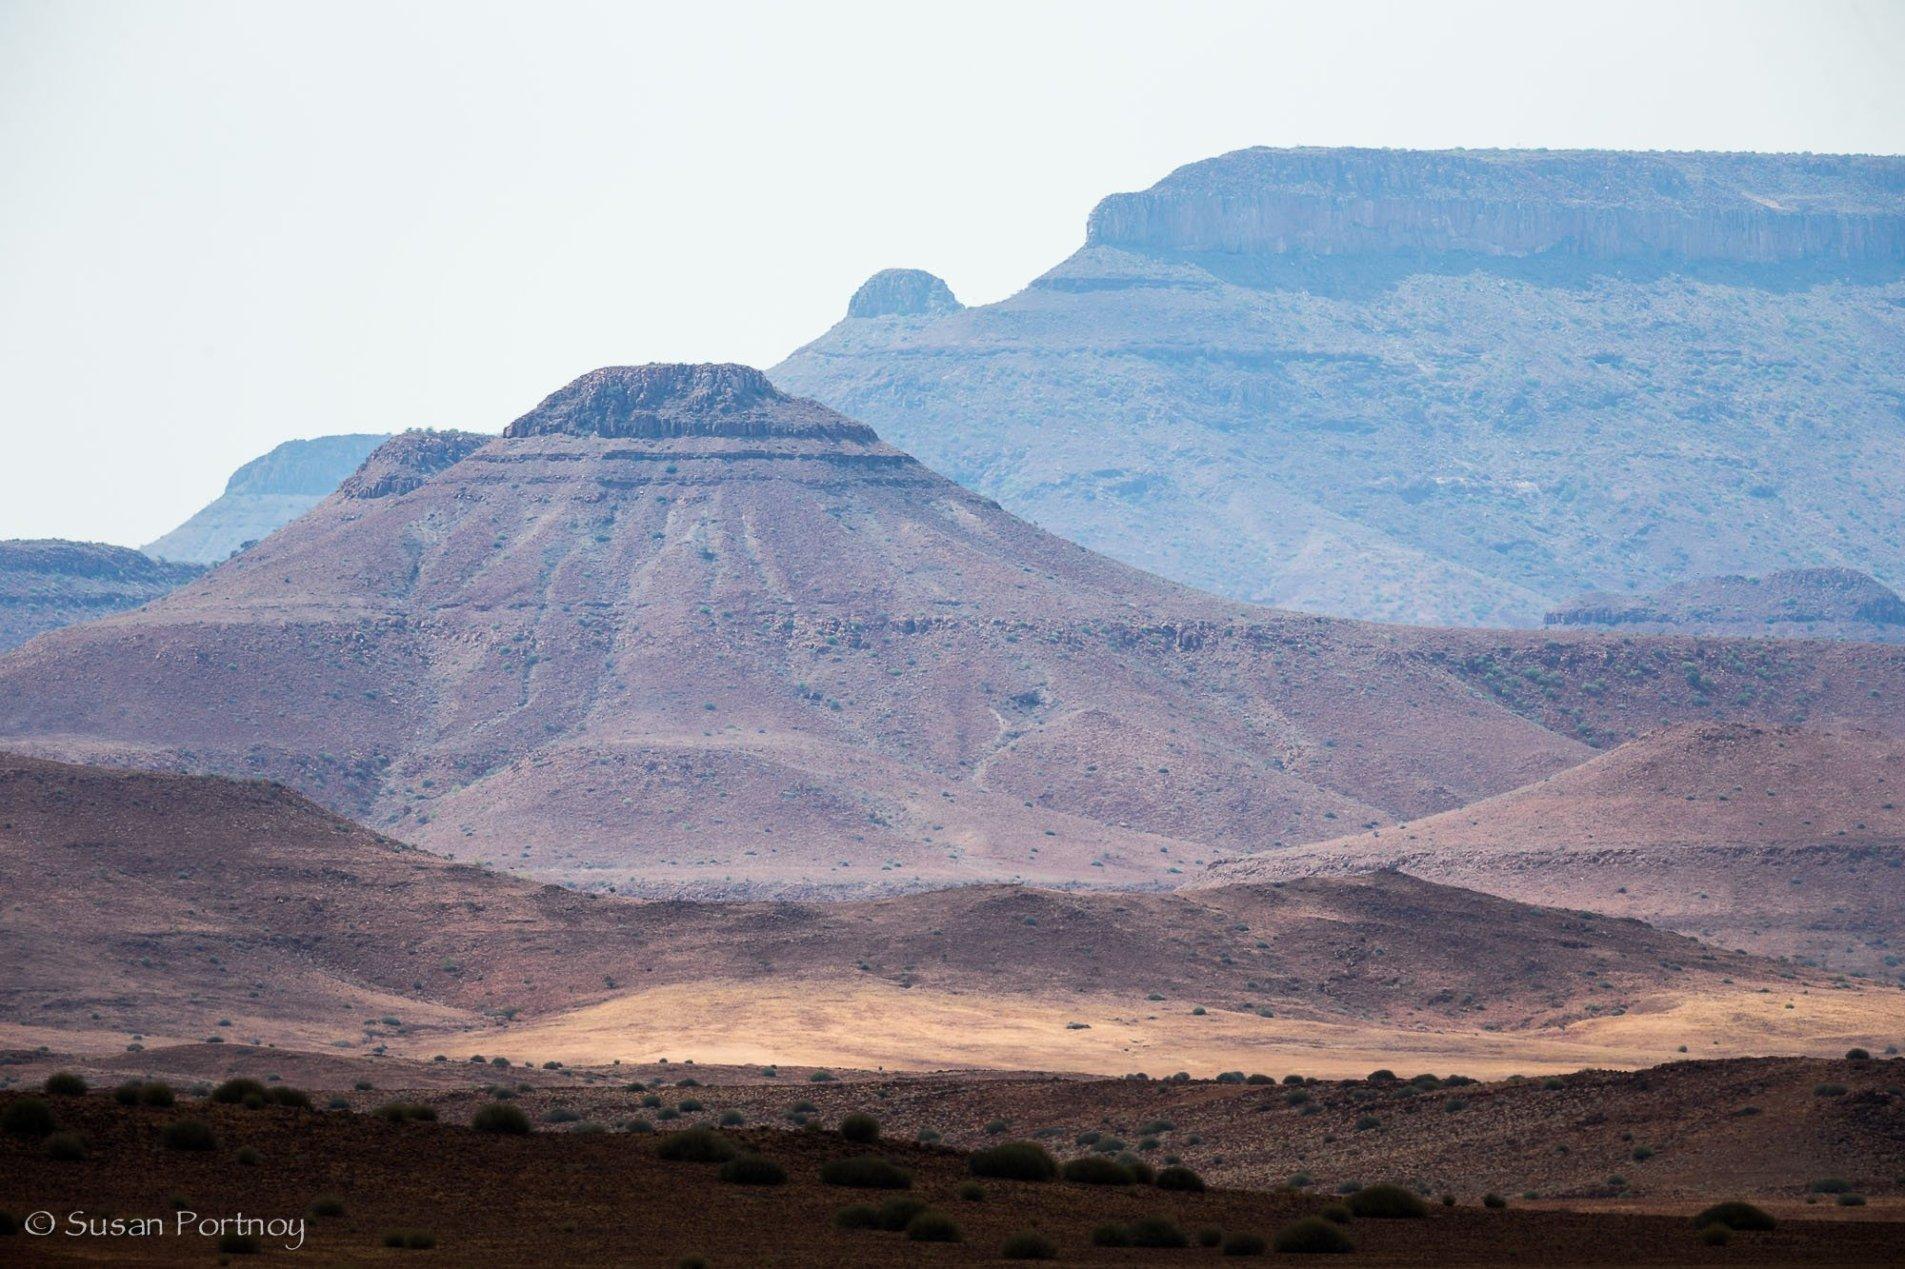 Mountains near Desert Rhino Camp in Namibia